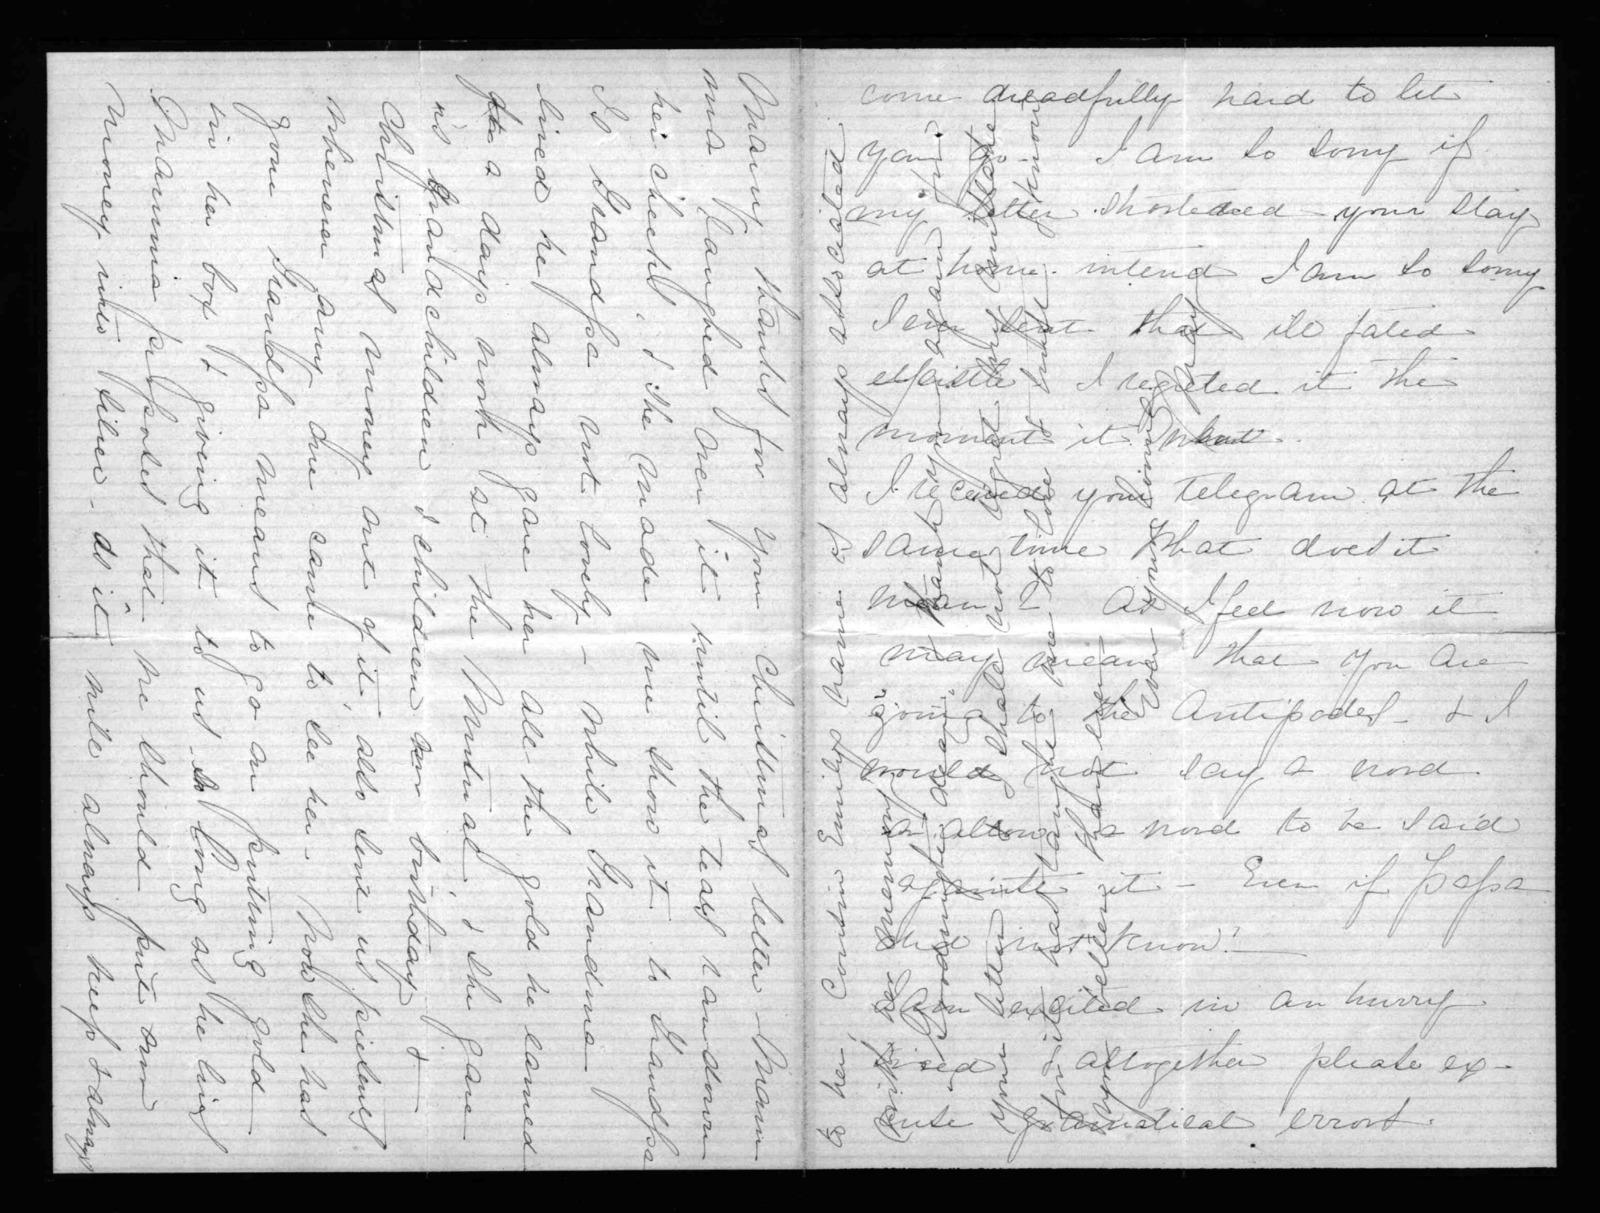 Letter from Mabel Hubbard Bell to Alexander Graham Bell, December 1876